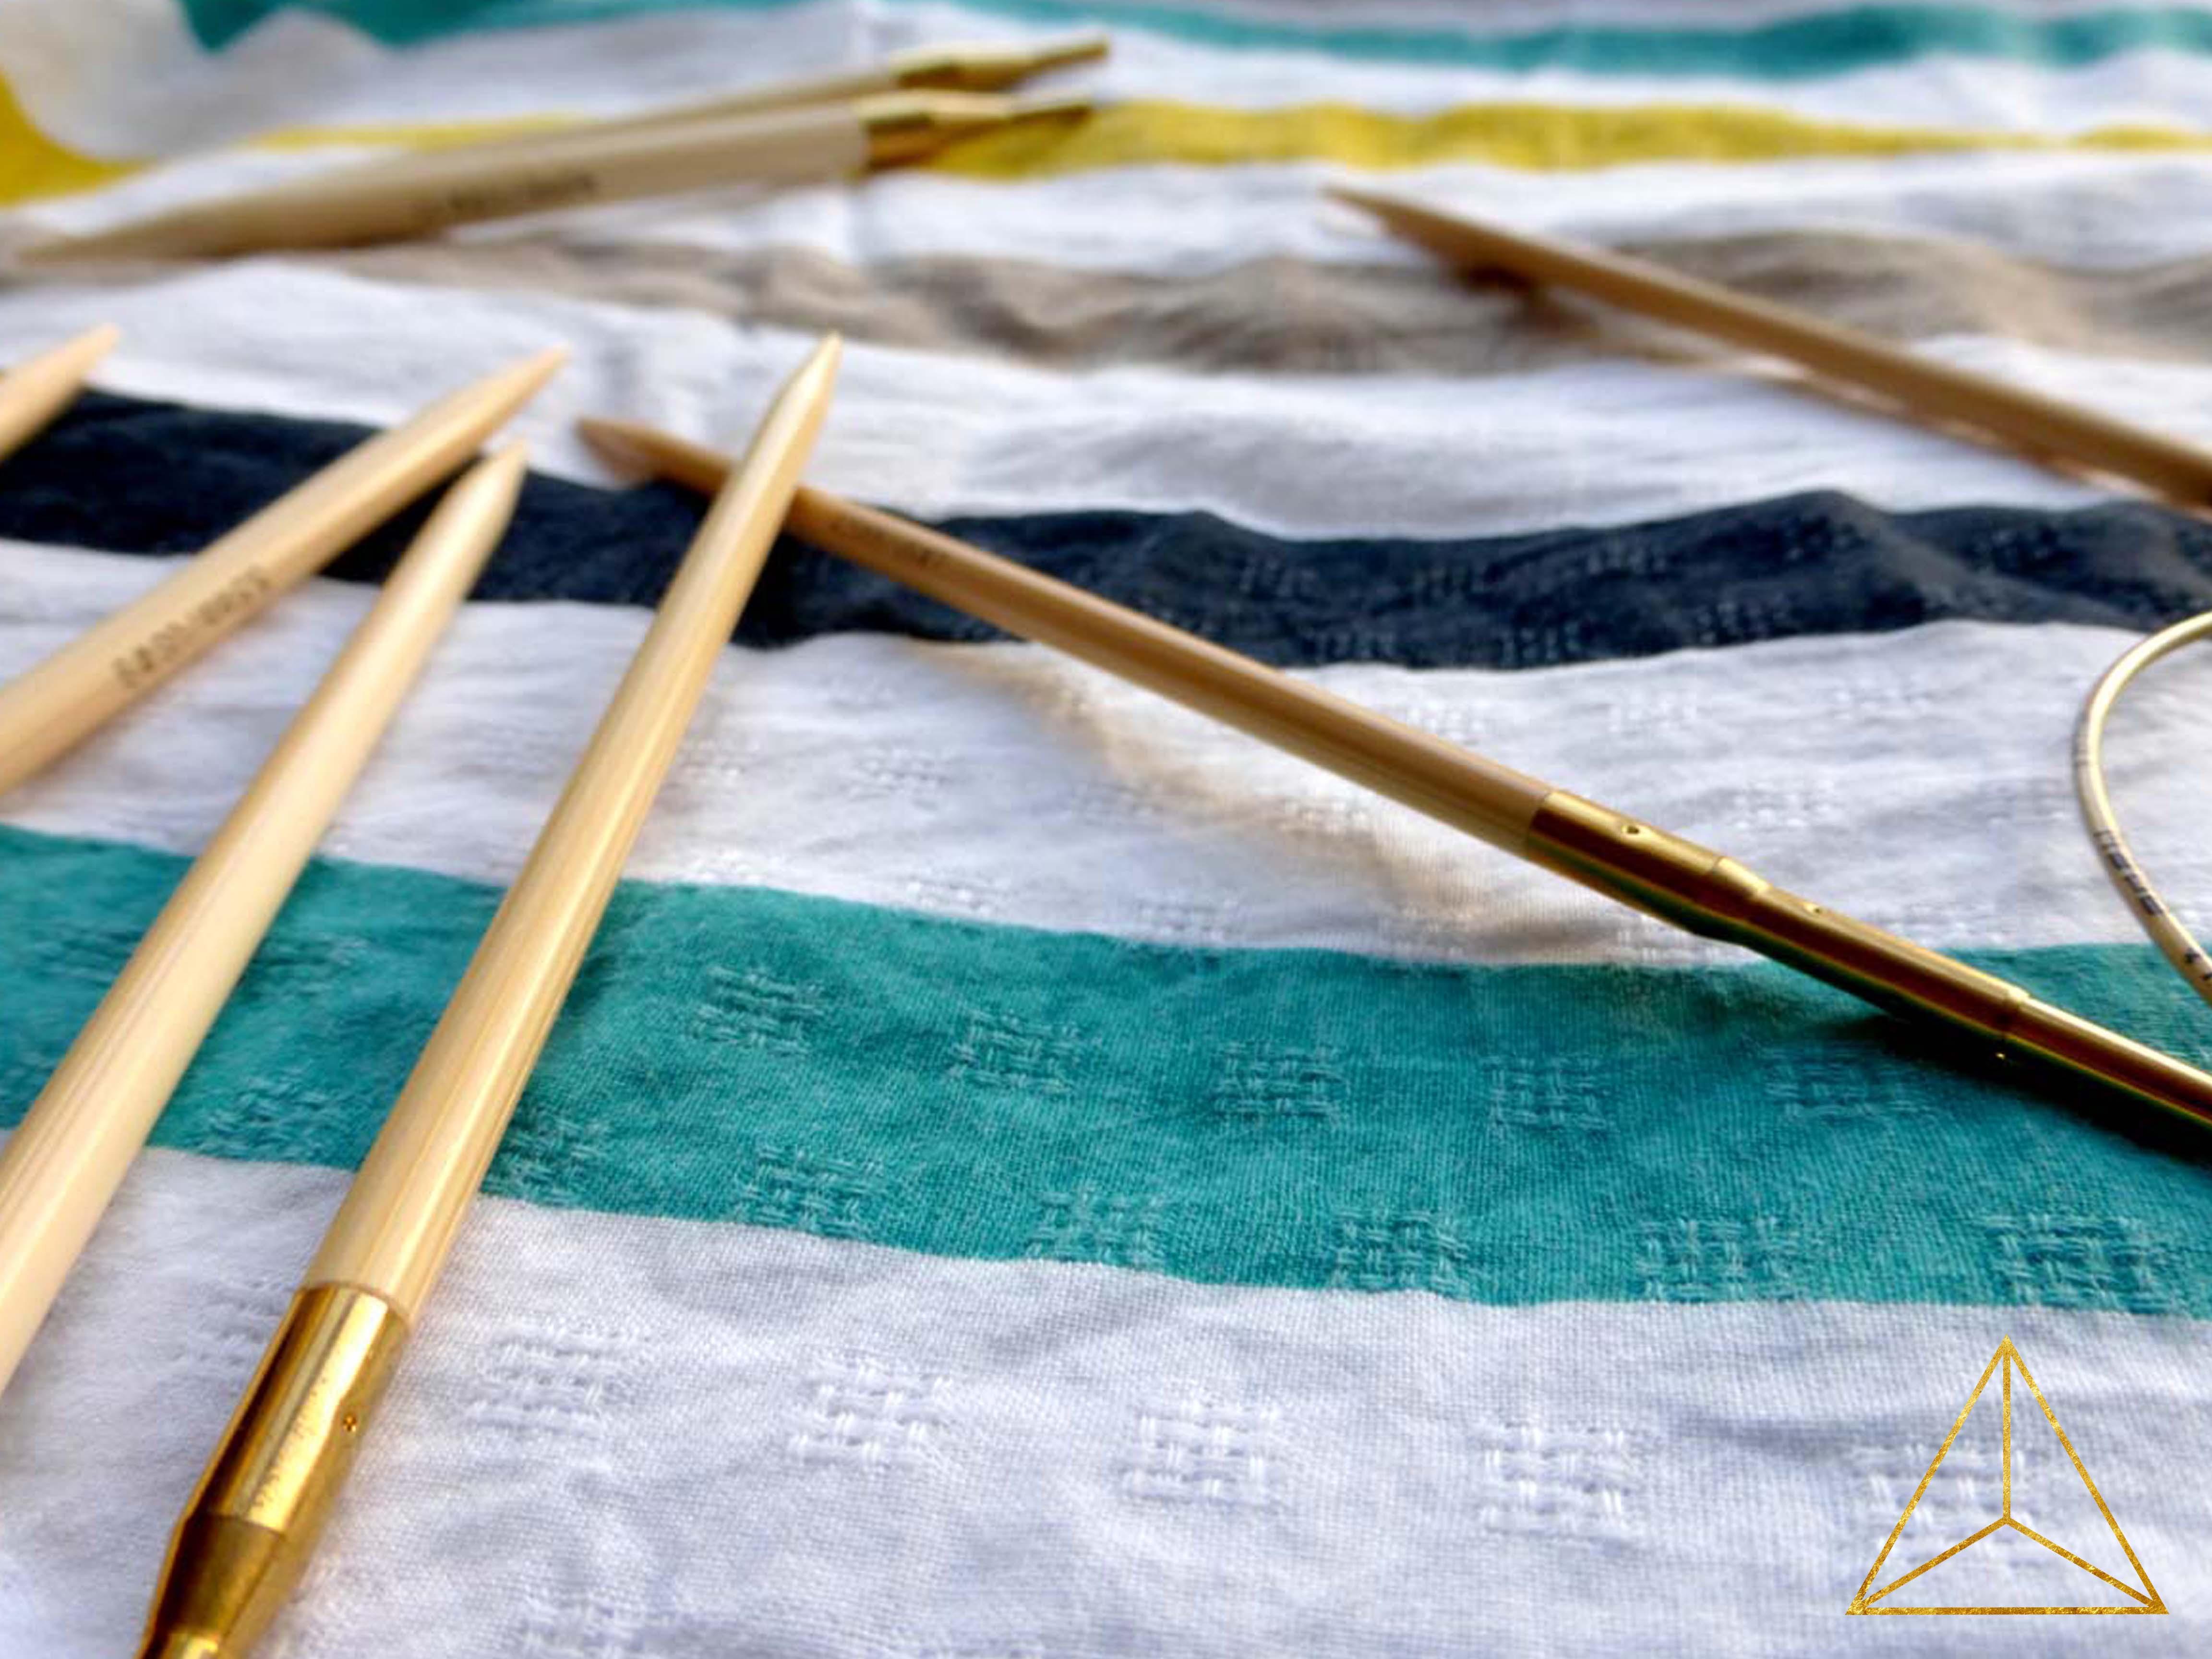 5 Tips To Regain Your Knitting Mojo | www.thefatedknitter.co.uk